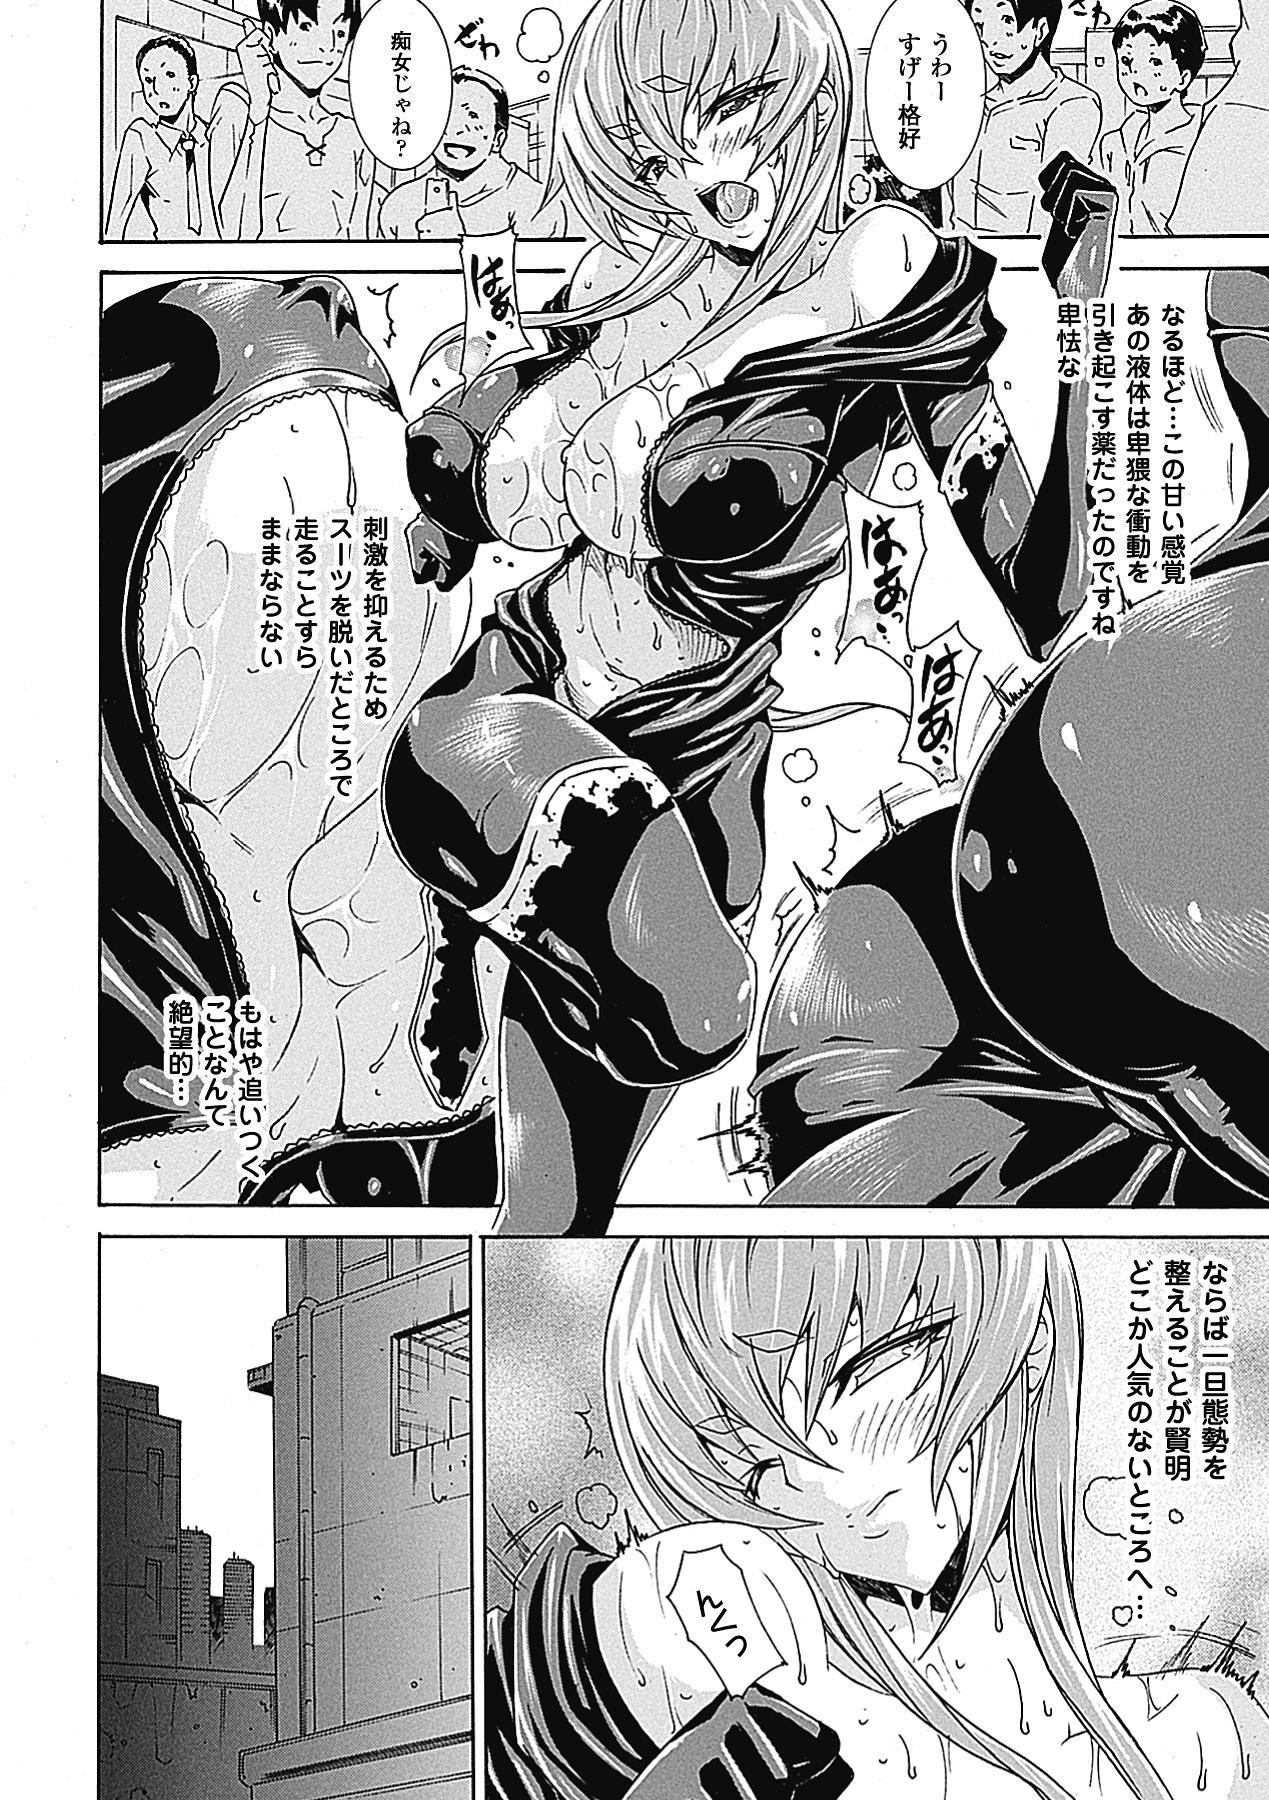 Megami Crisis 1 76